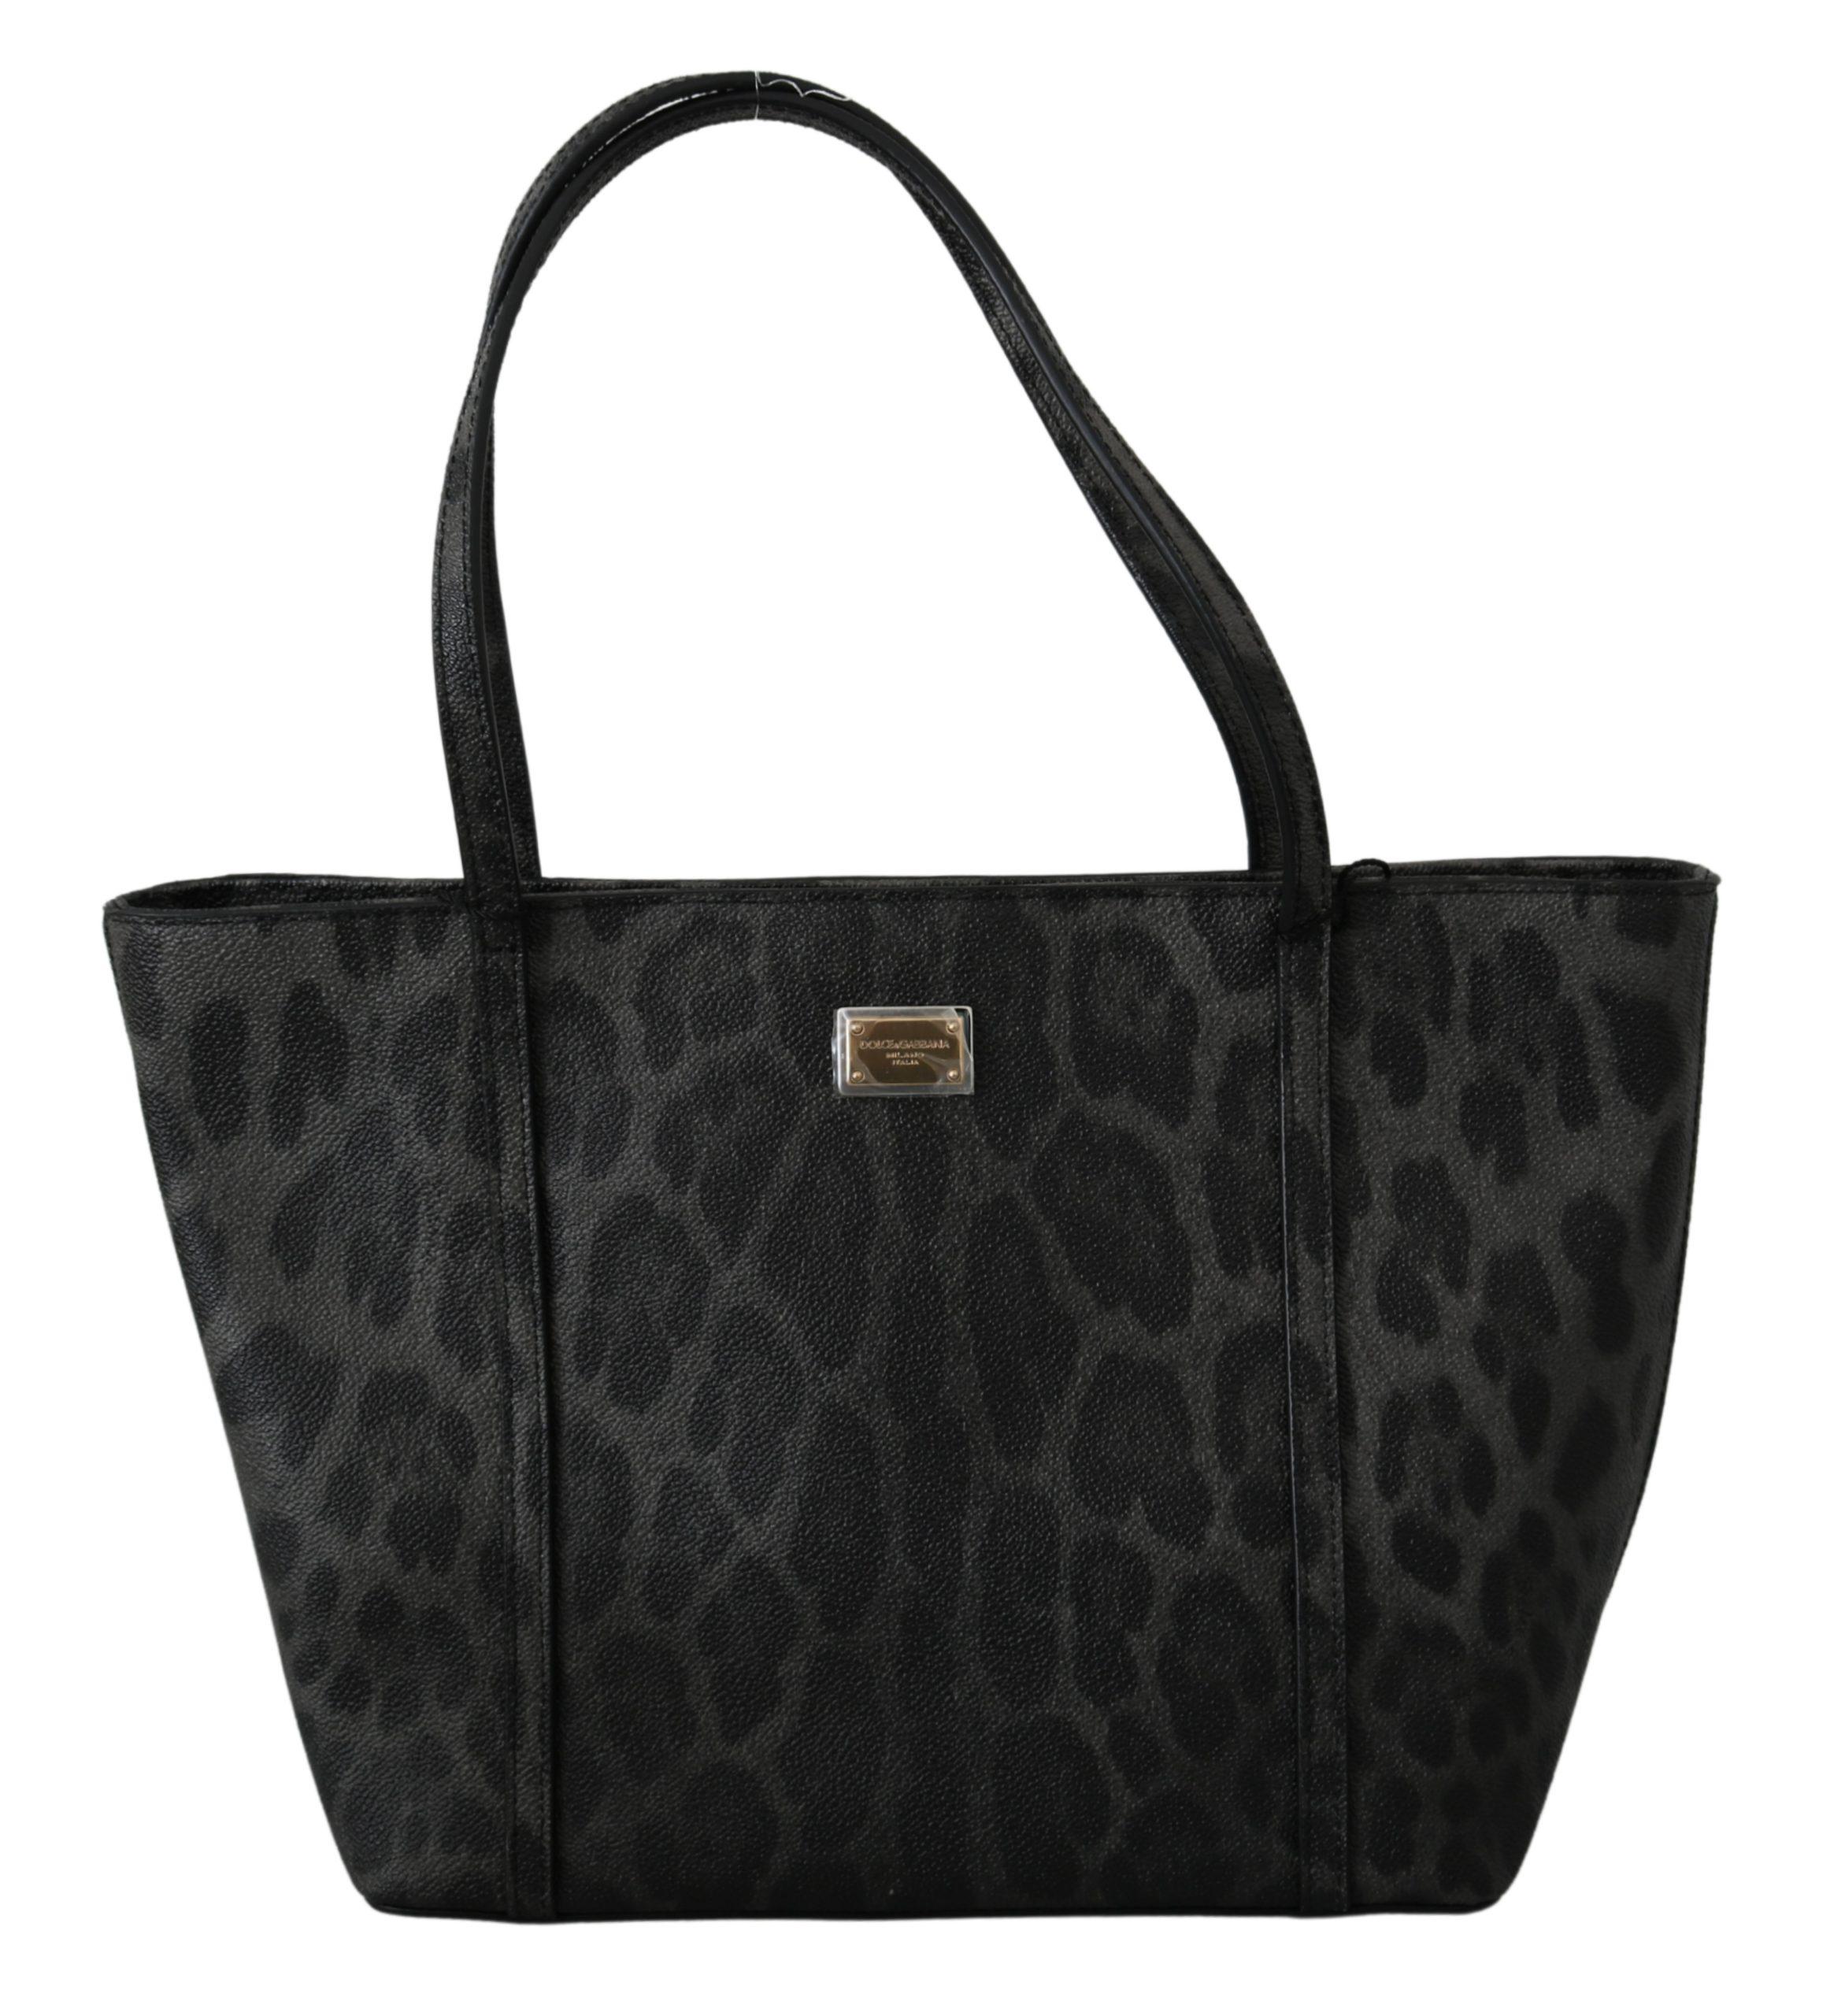 Dolce & Gabbana Women's Leopard Logo Tote Bag Black VAS9604